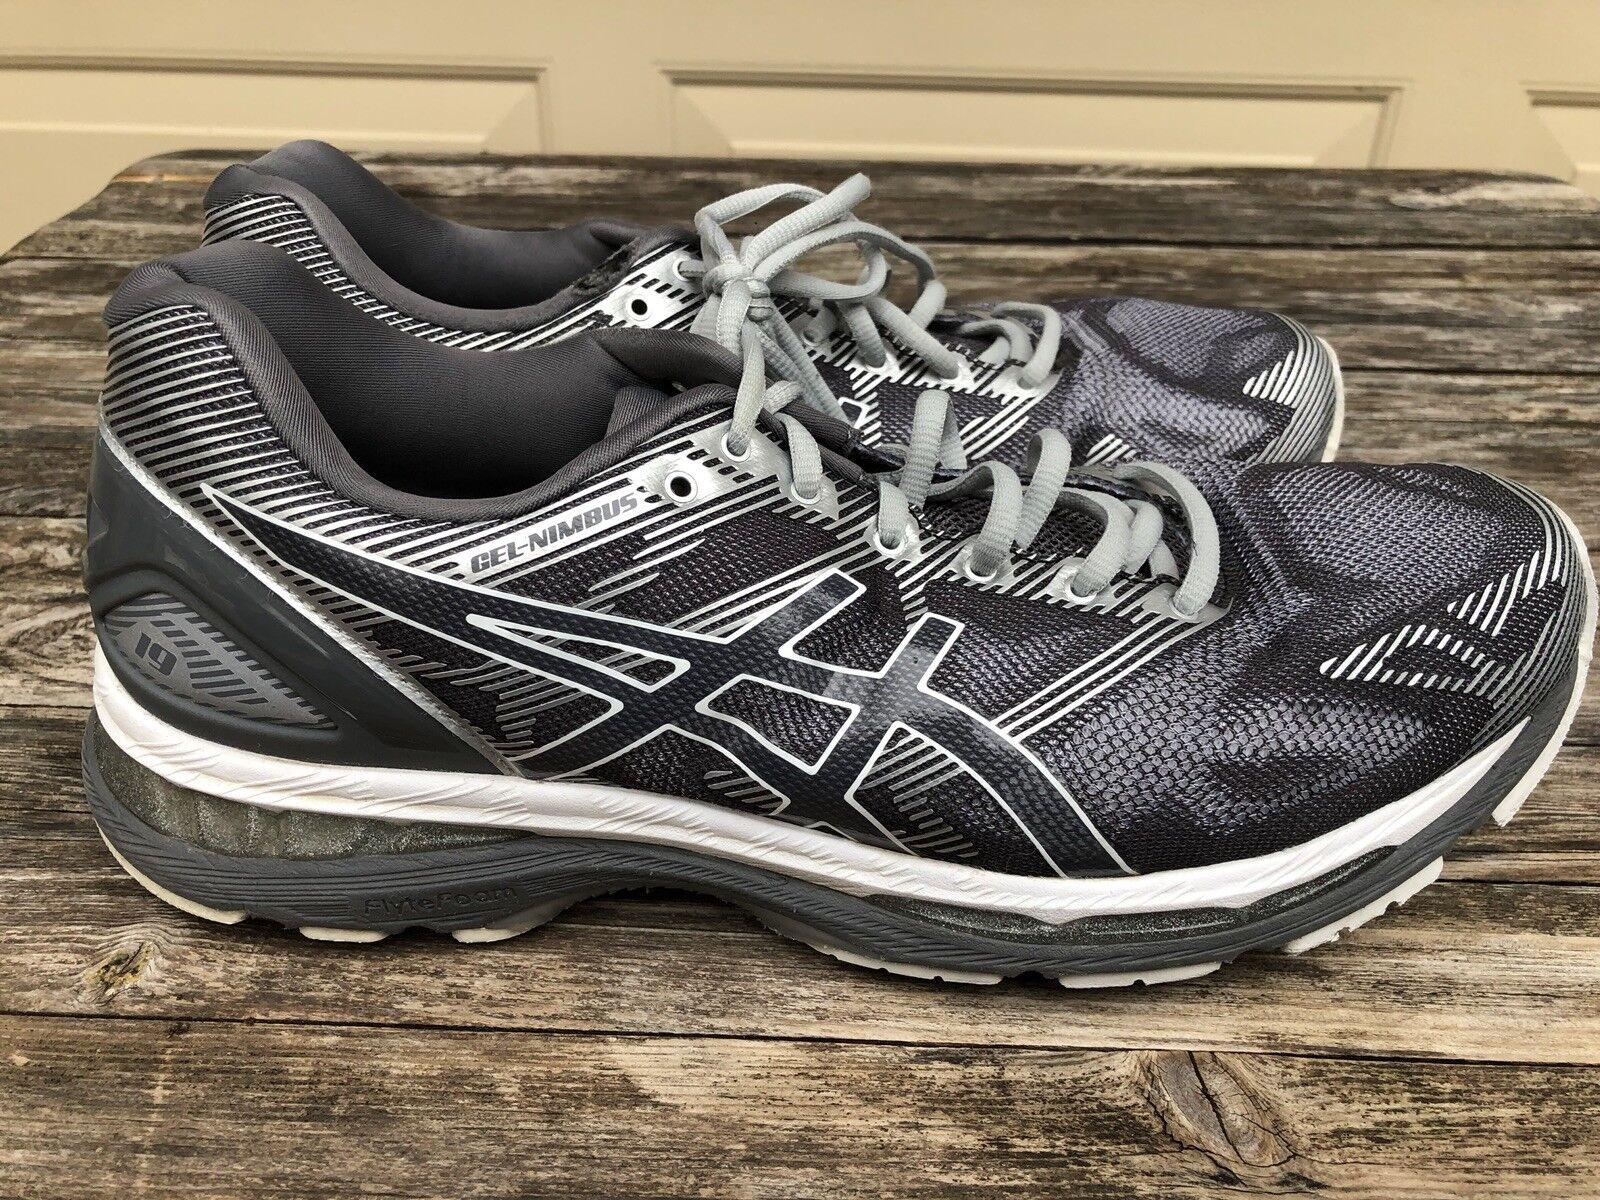 Asics Gel Nimbus 19 Mens Running shoes Size 10